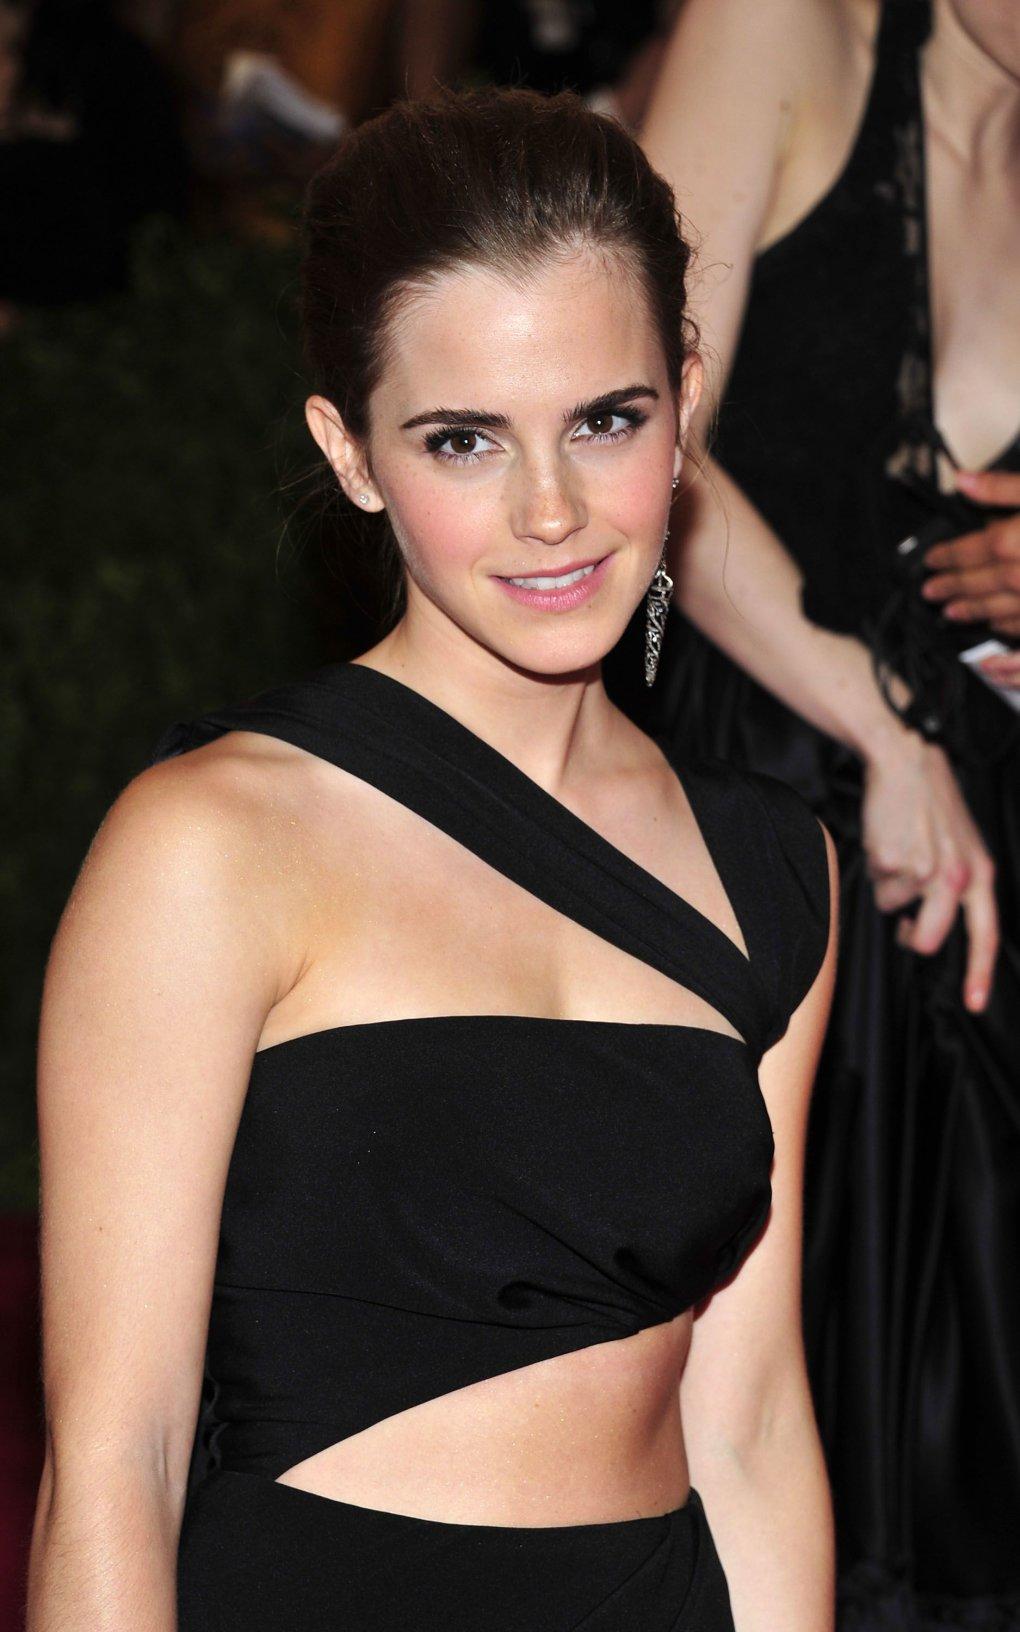 The Hottest Photos Of Emma Watson - Barnorama